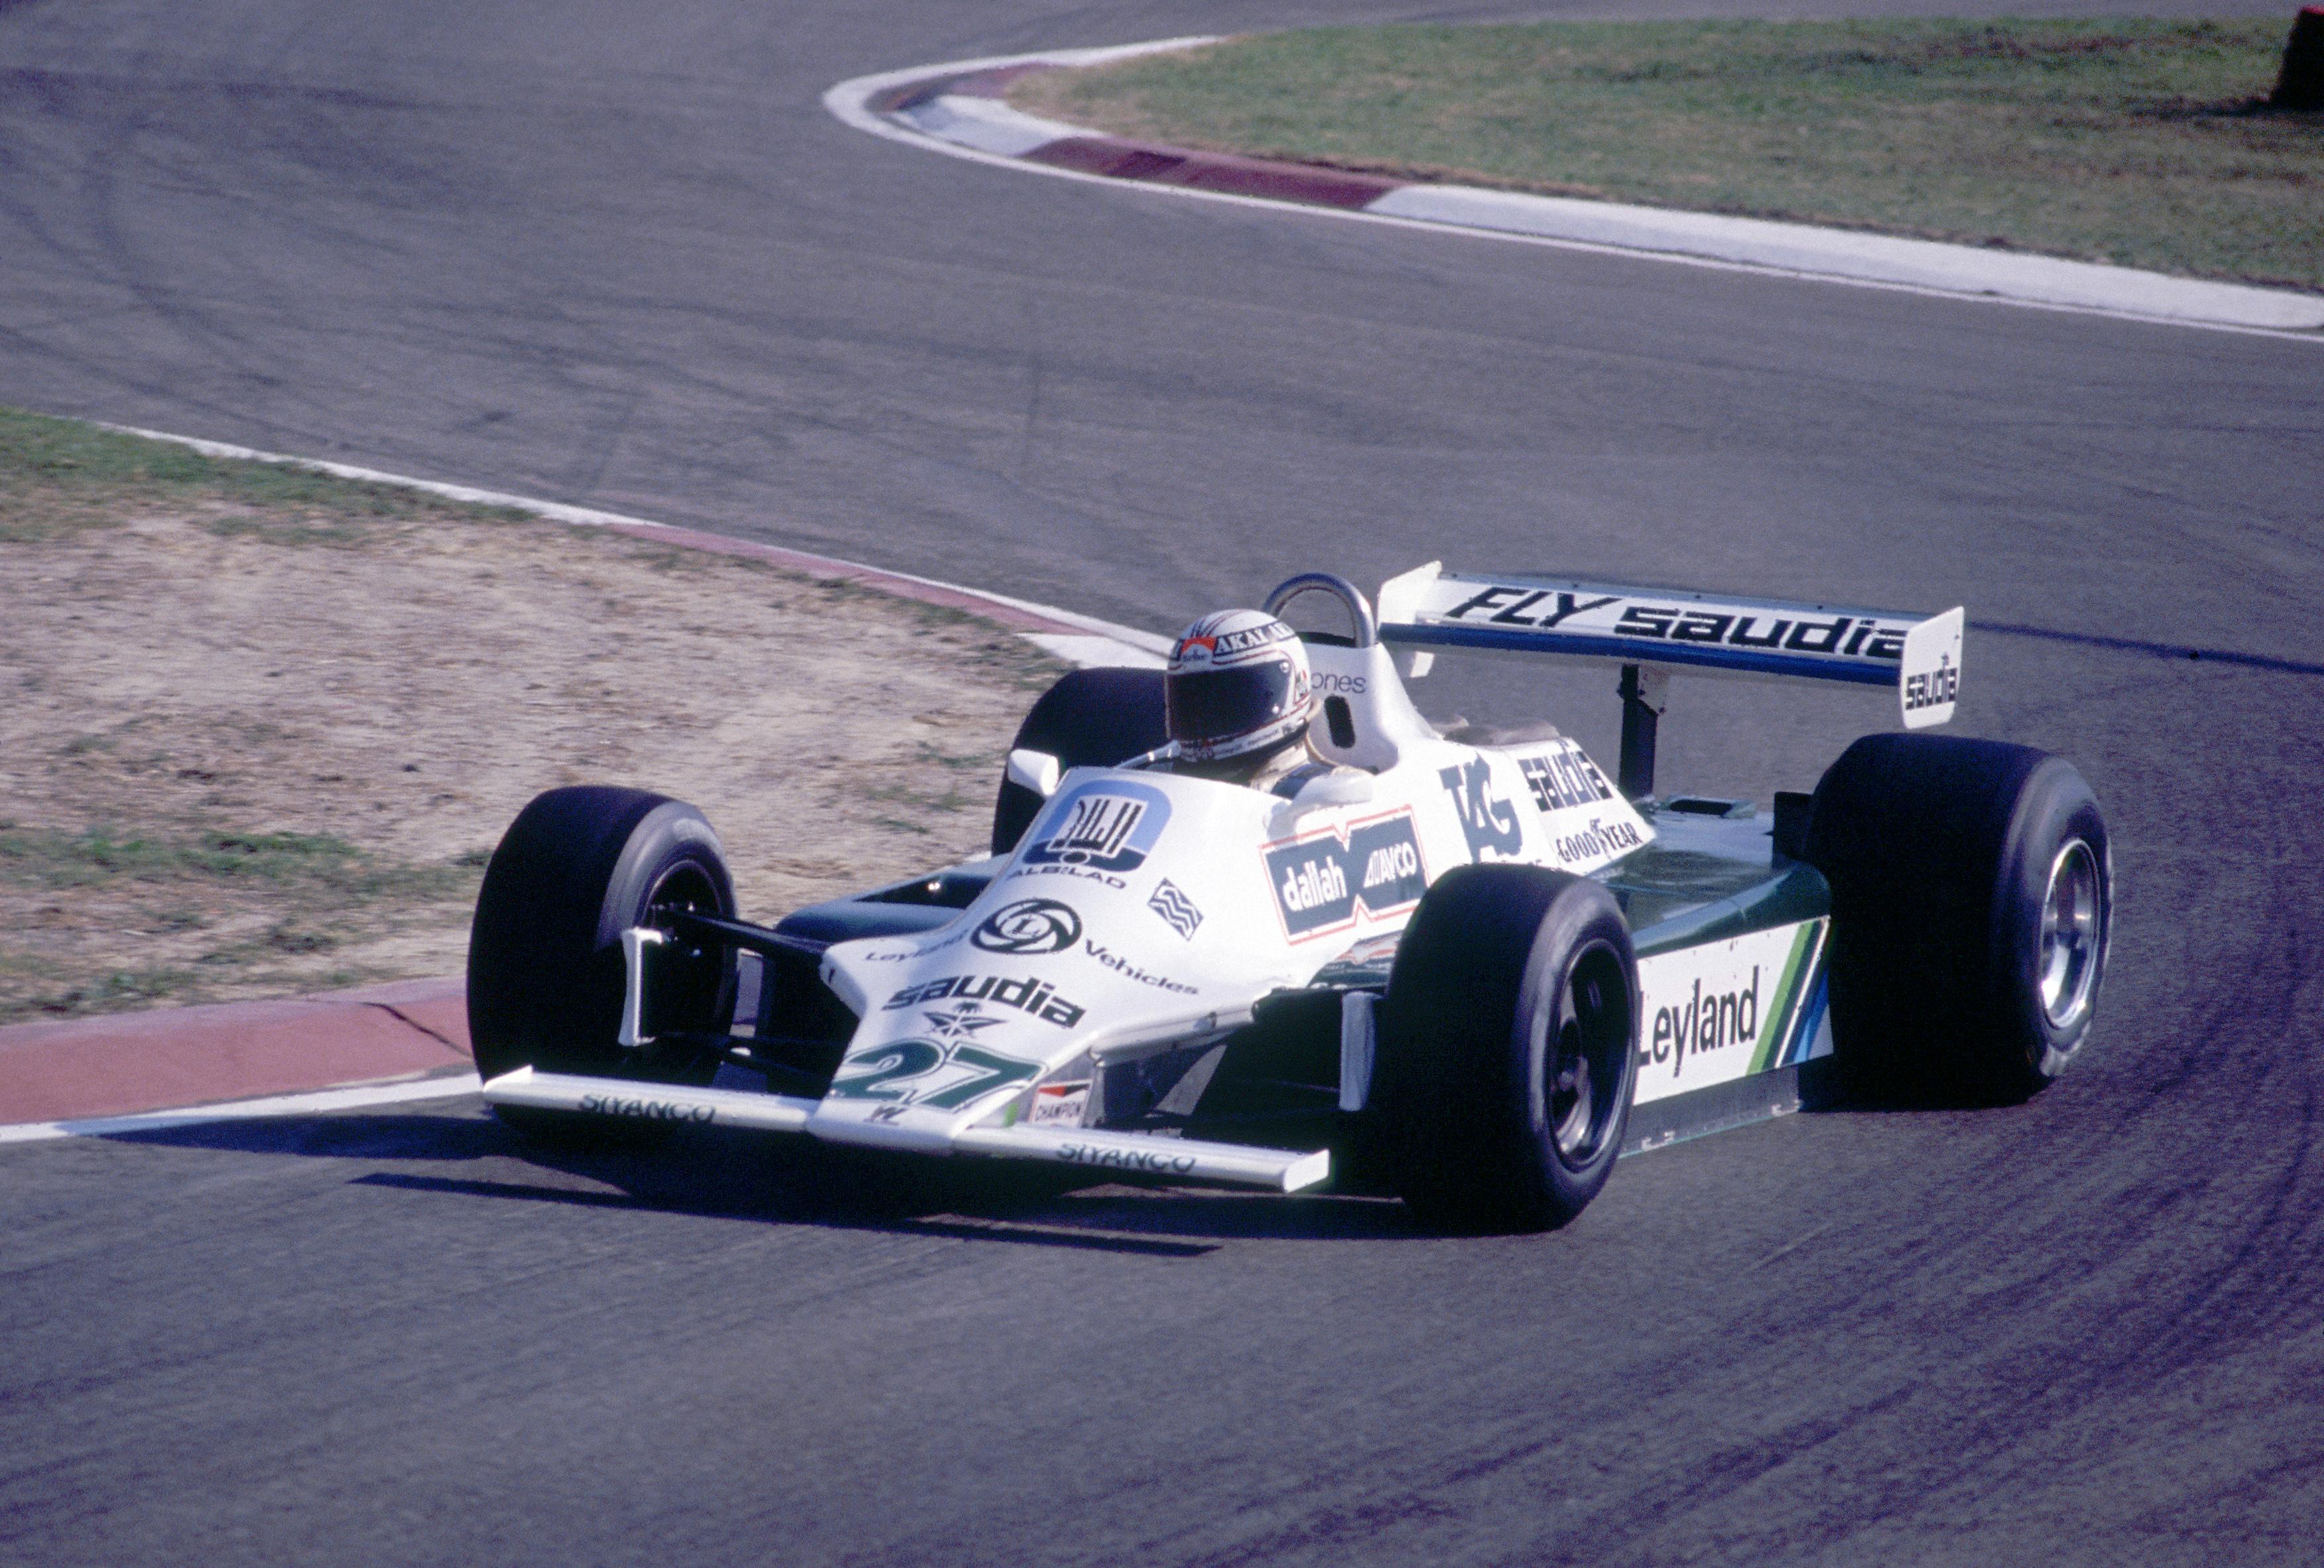 Alan Jones Williams Italian Grand Prix 1980 Imola